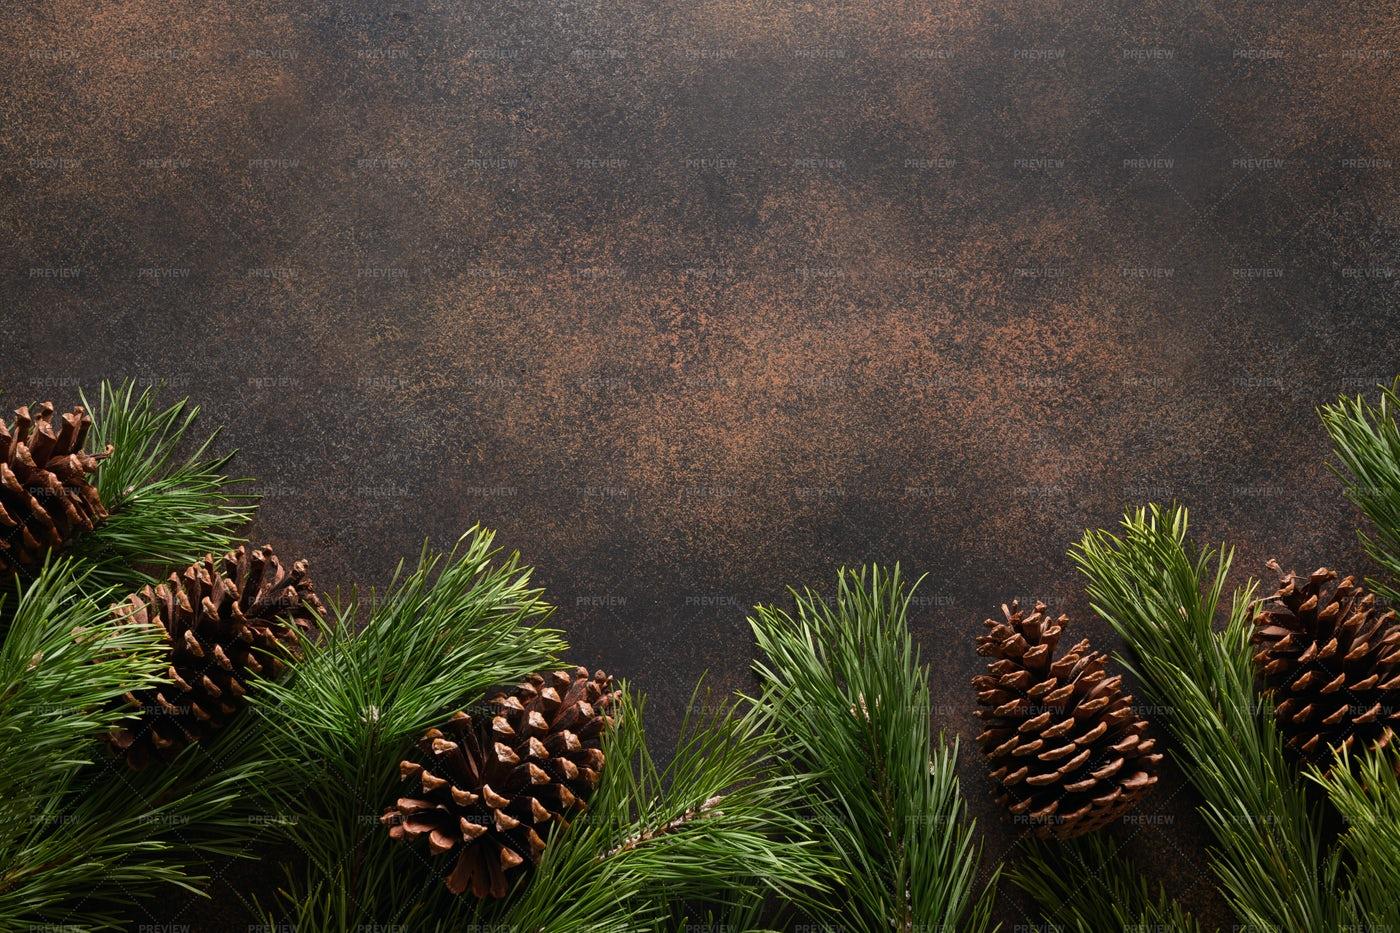 Christmas Border With Evergreen Branches: Stock Photos